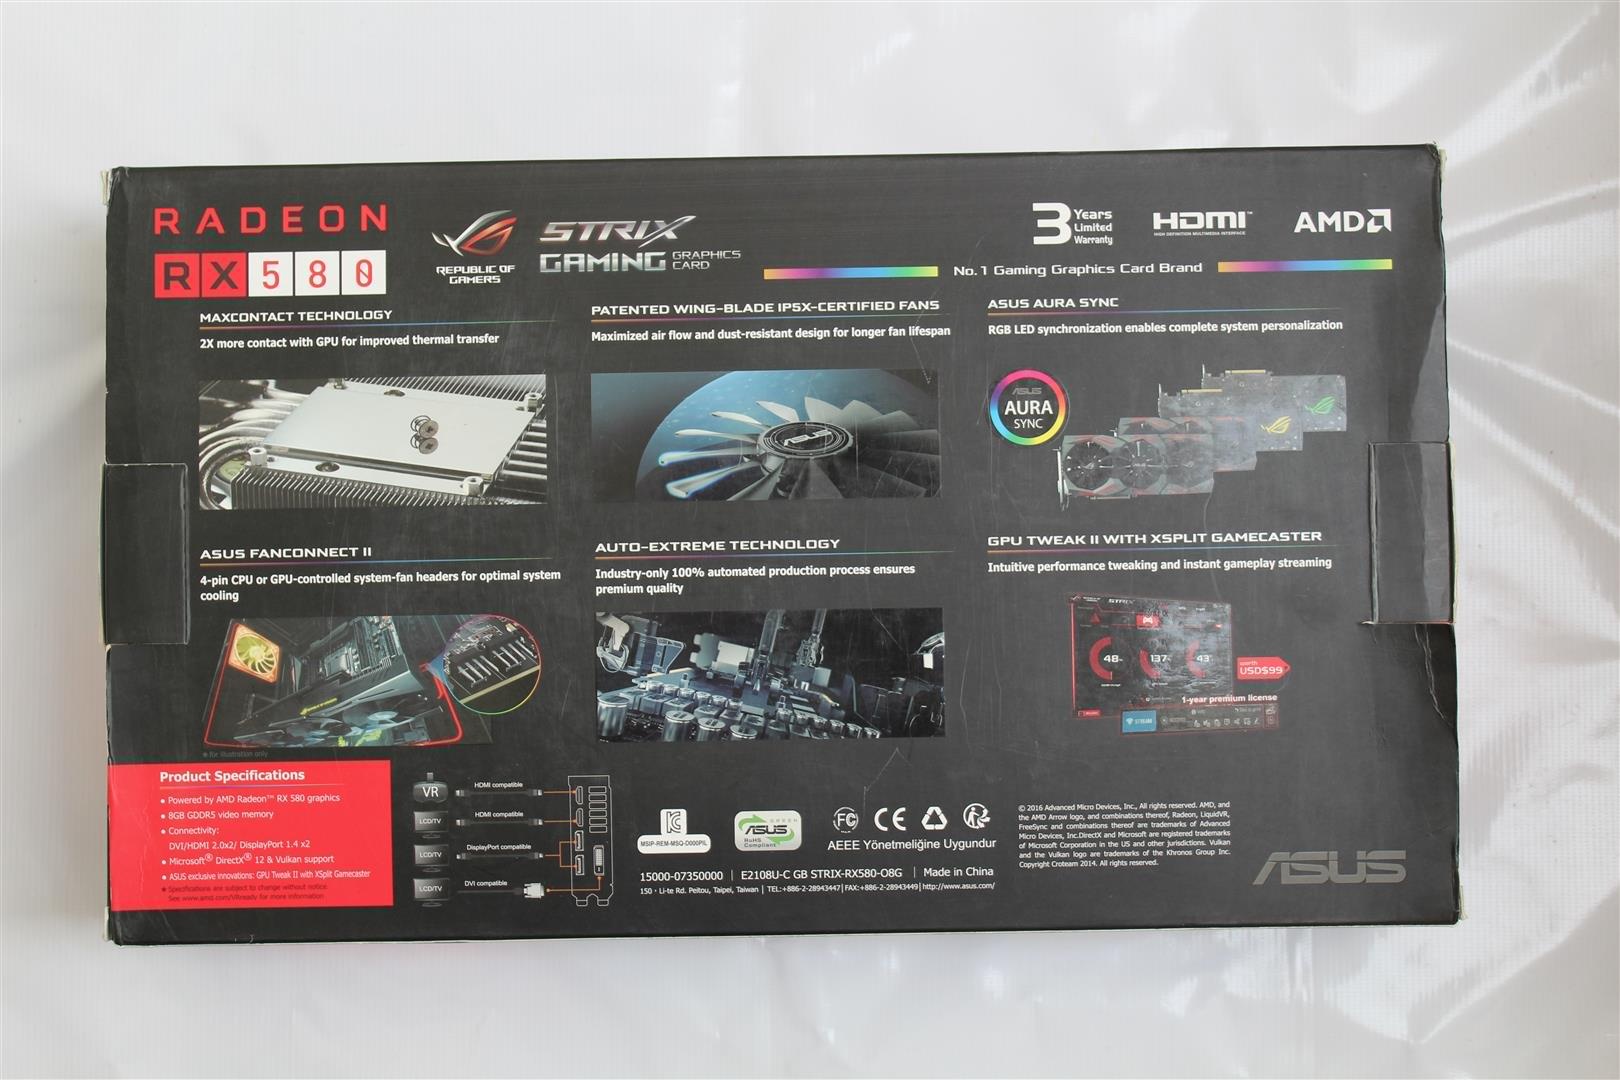 ASUS ROG STRIX RX580 Review - PC TeK REVIEWS